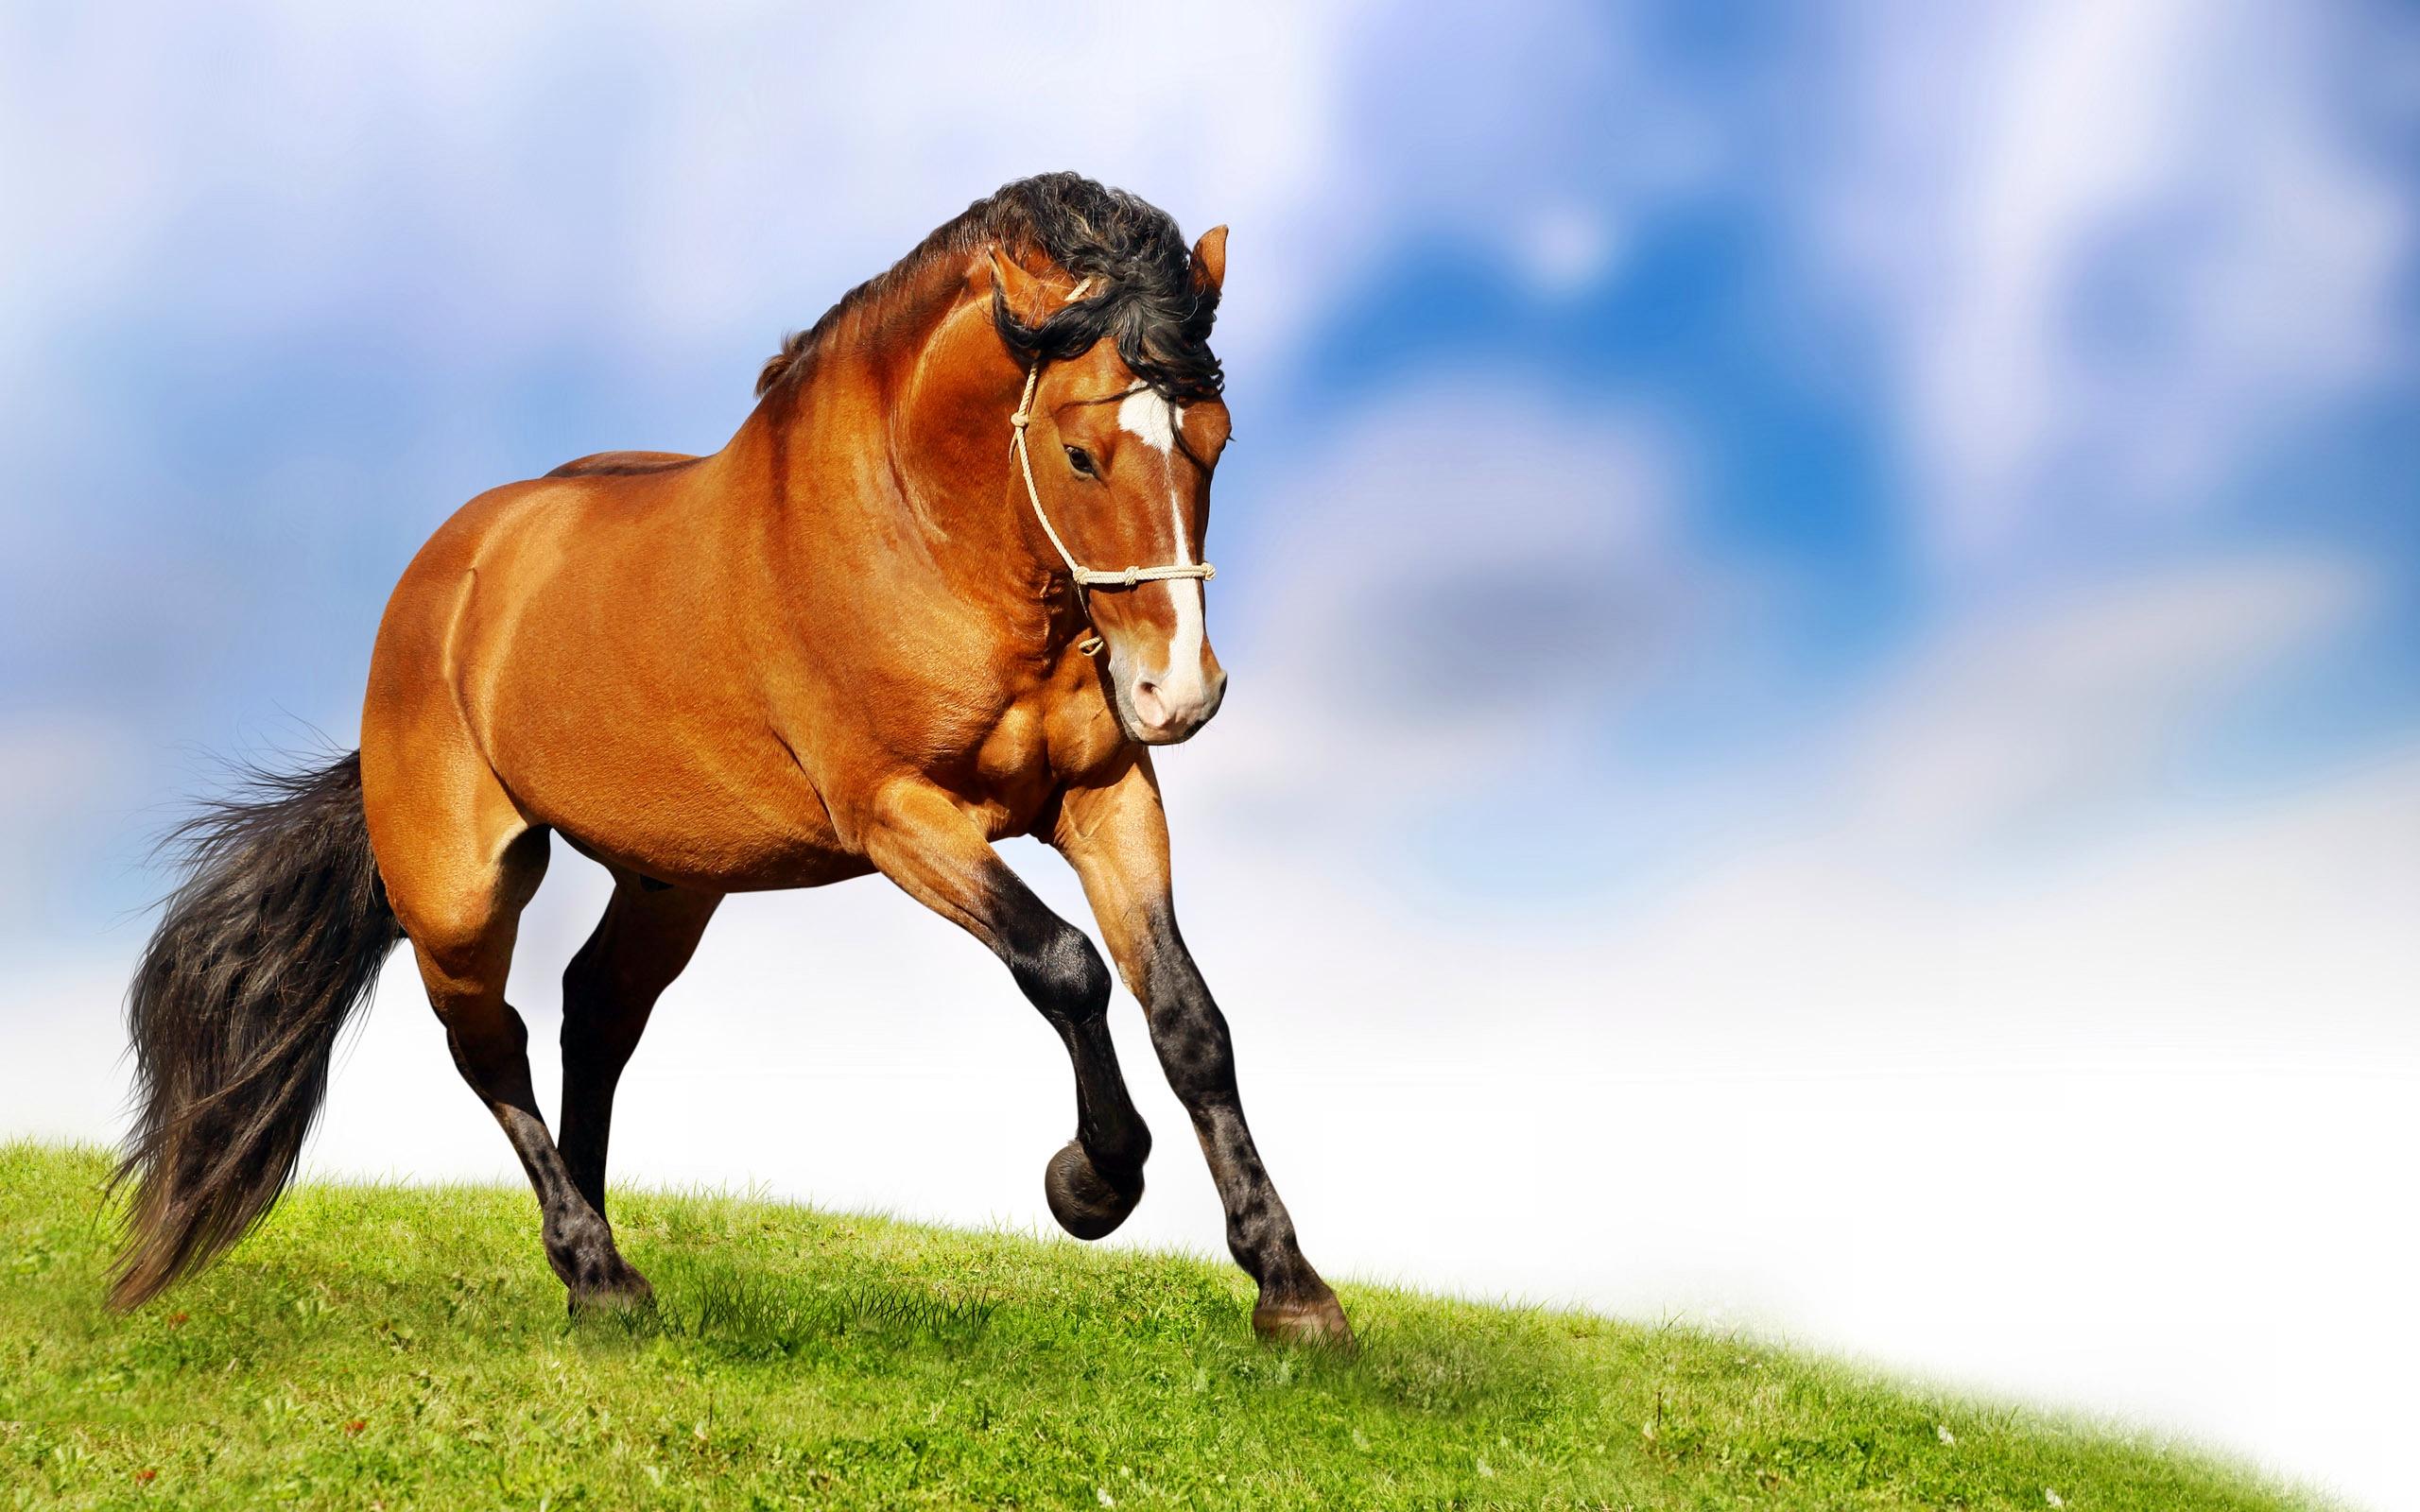 лошади обои на рабочий стол 1280х1024 № 489543 без смс